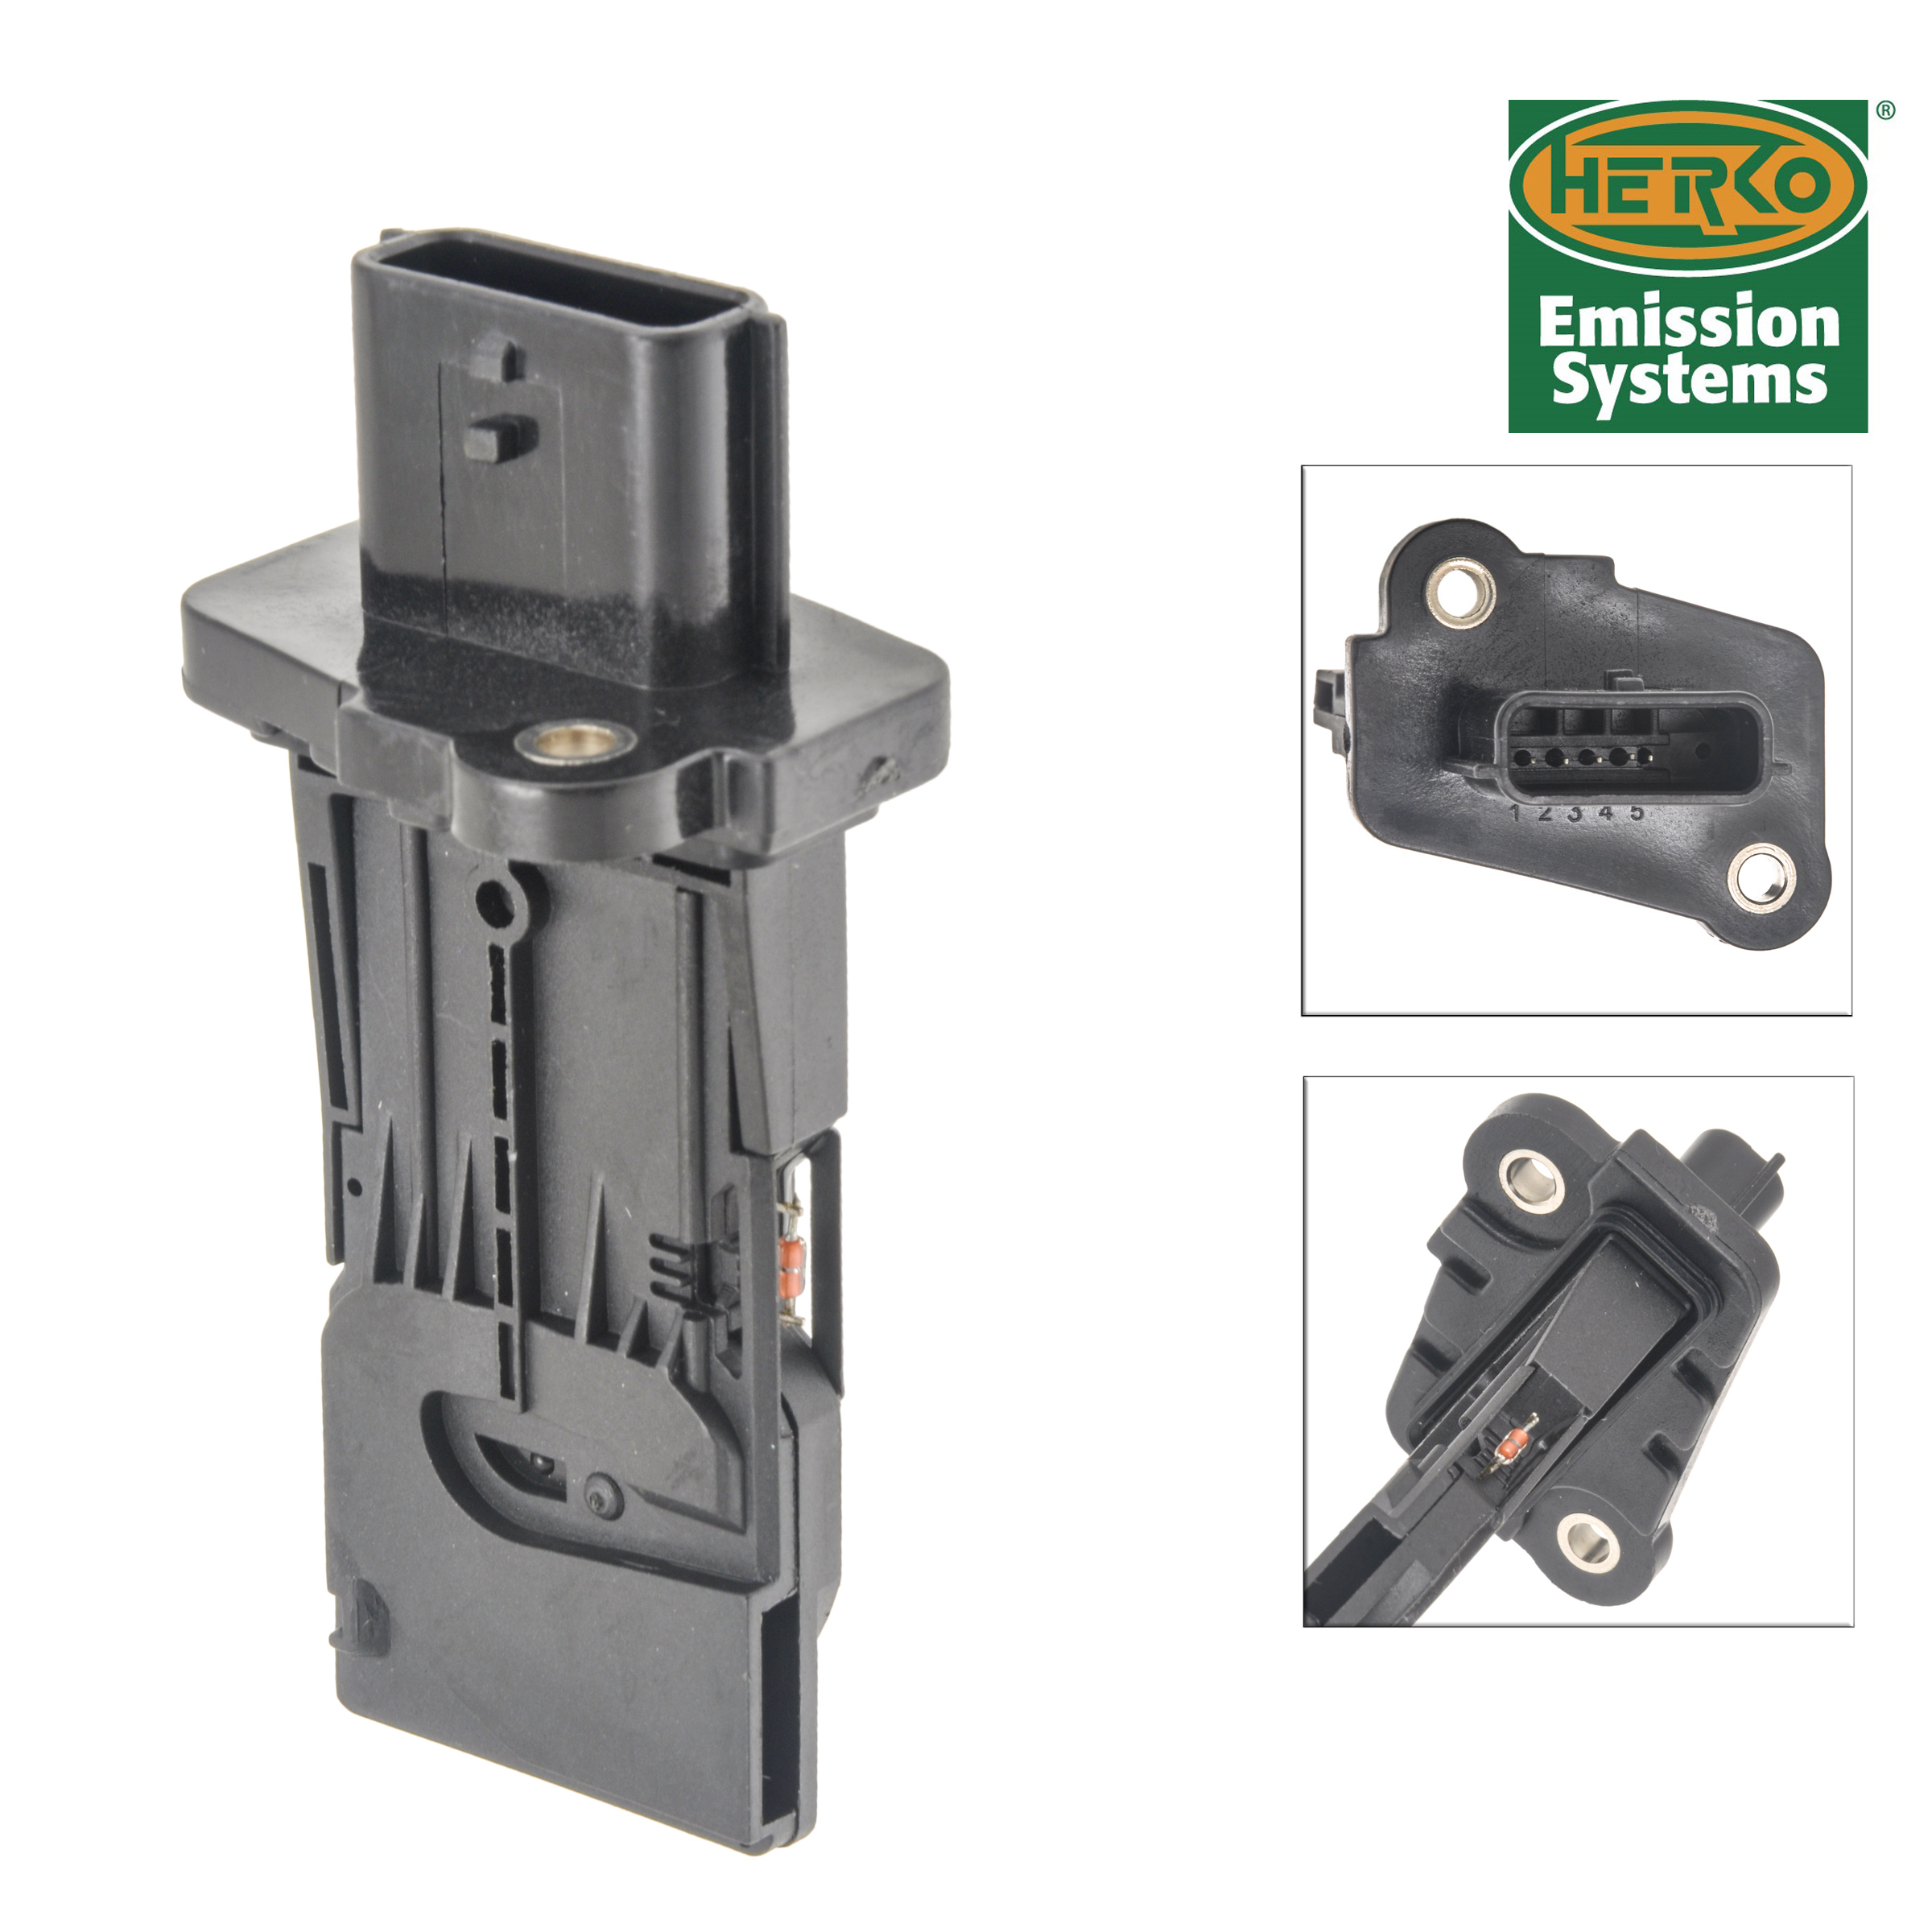 Herko Mass Air Flow Sensor MAF289 For Nissan Altima Sentra Pathfinder 2013-2016